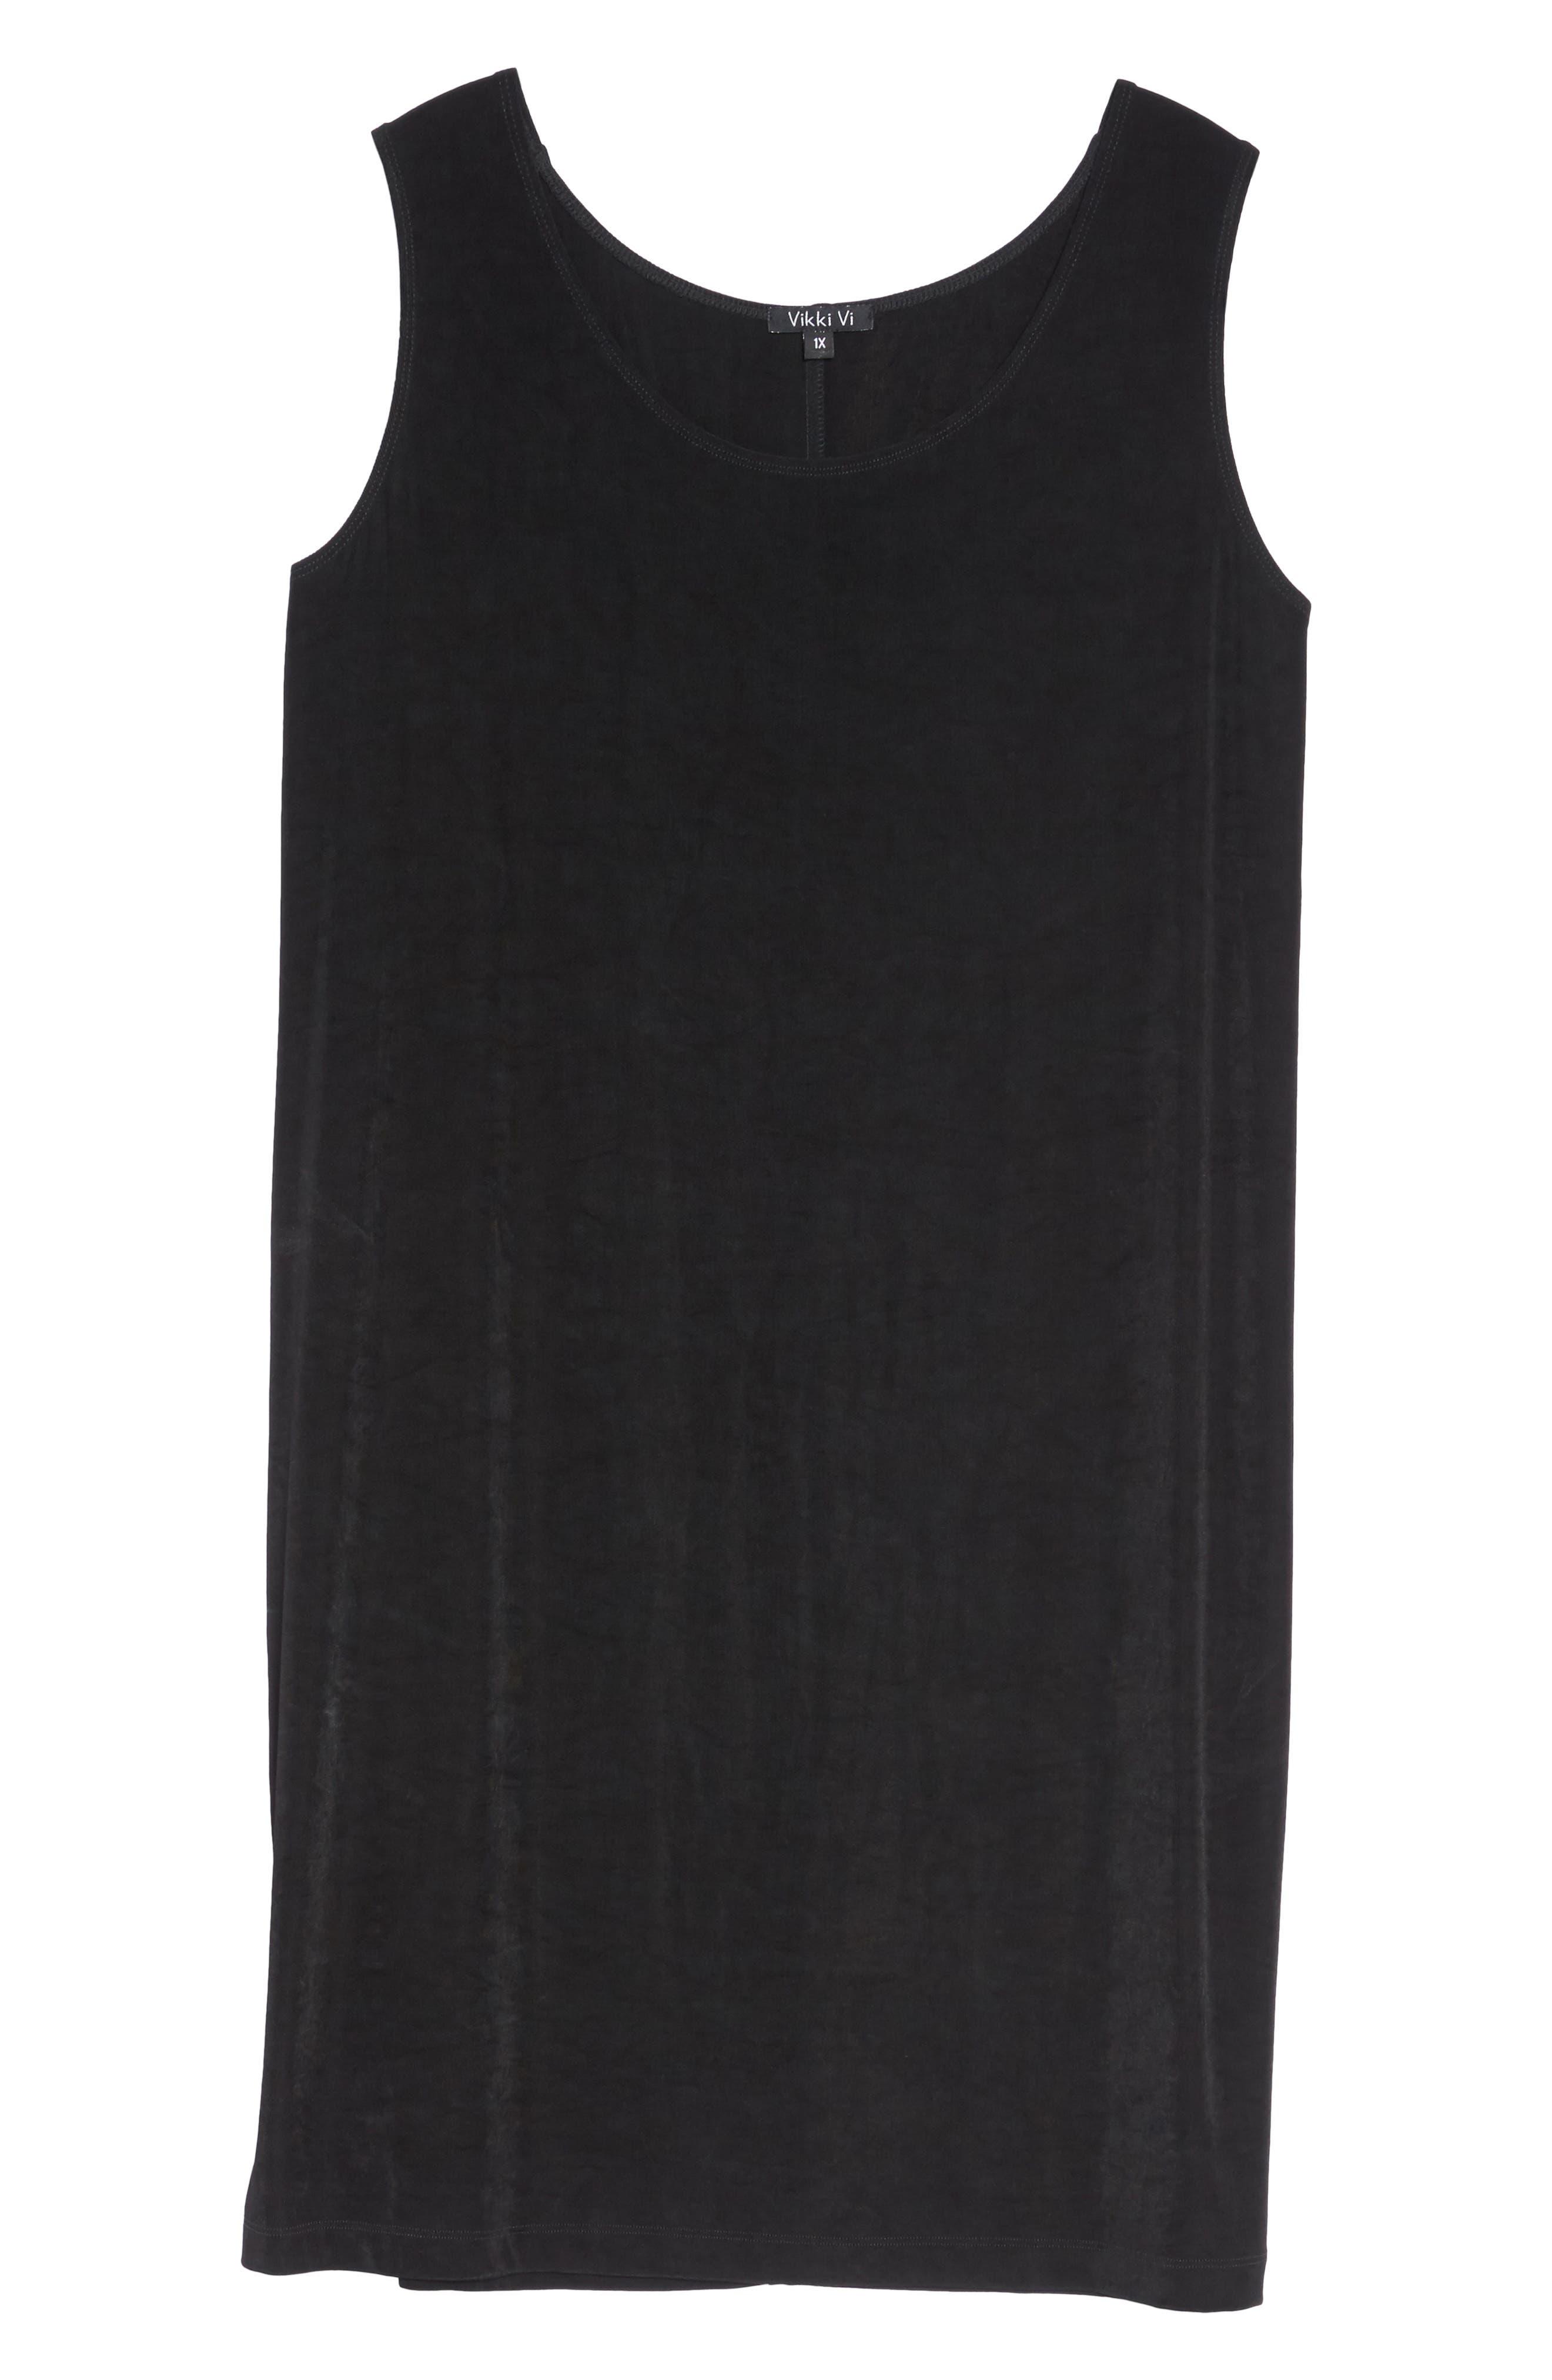 VIKKI VI,                             Sleeveless Shift Dress,                             Alternate thumbnail 6, color,                             BLACK